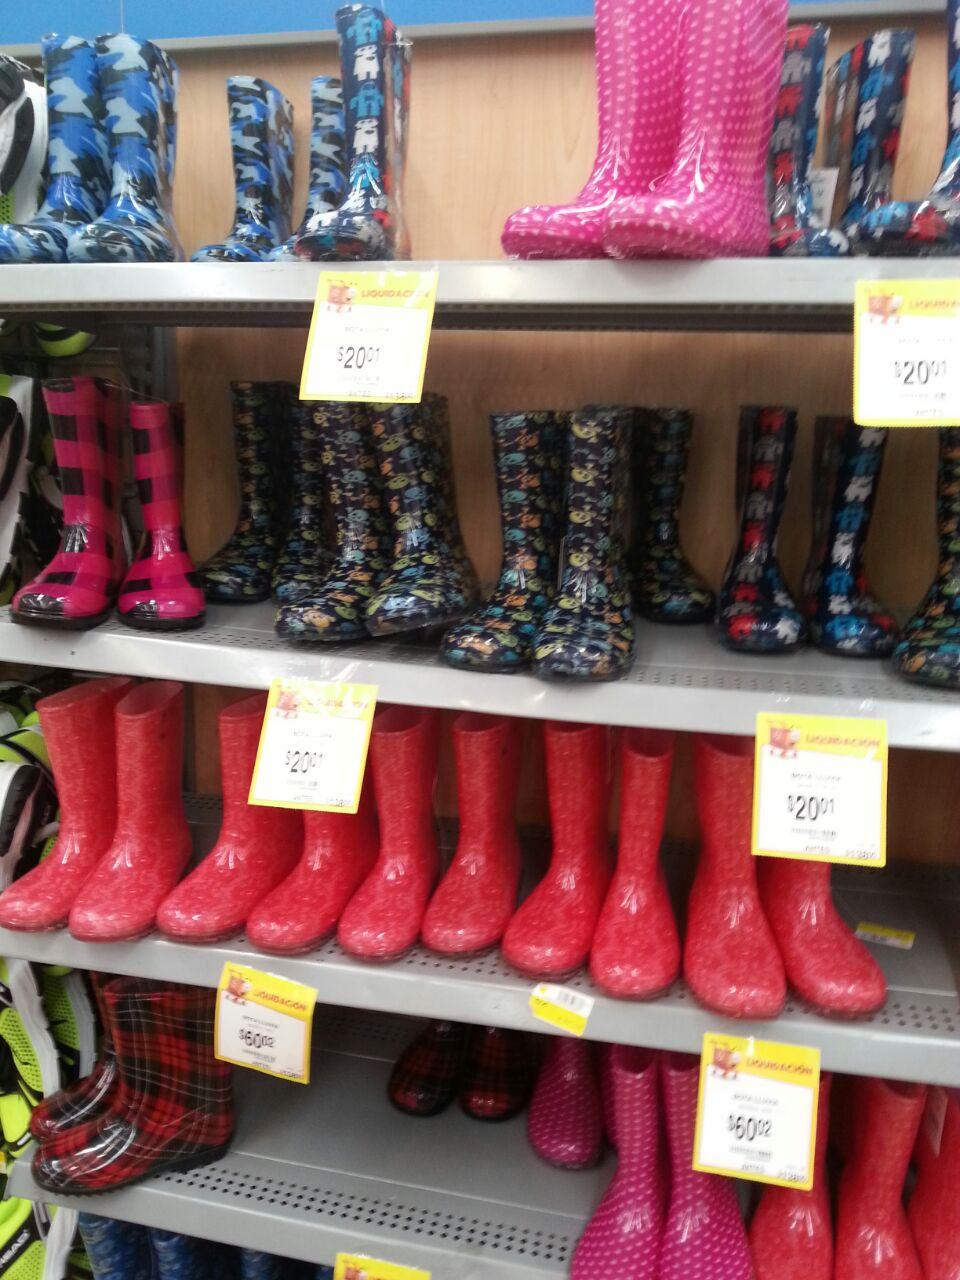 Walmart Cd Jardin: botas de lluvia infantil a $20.01